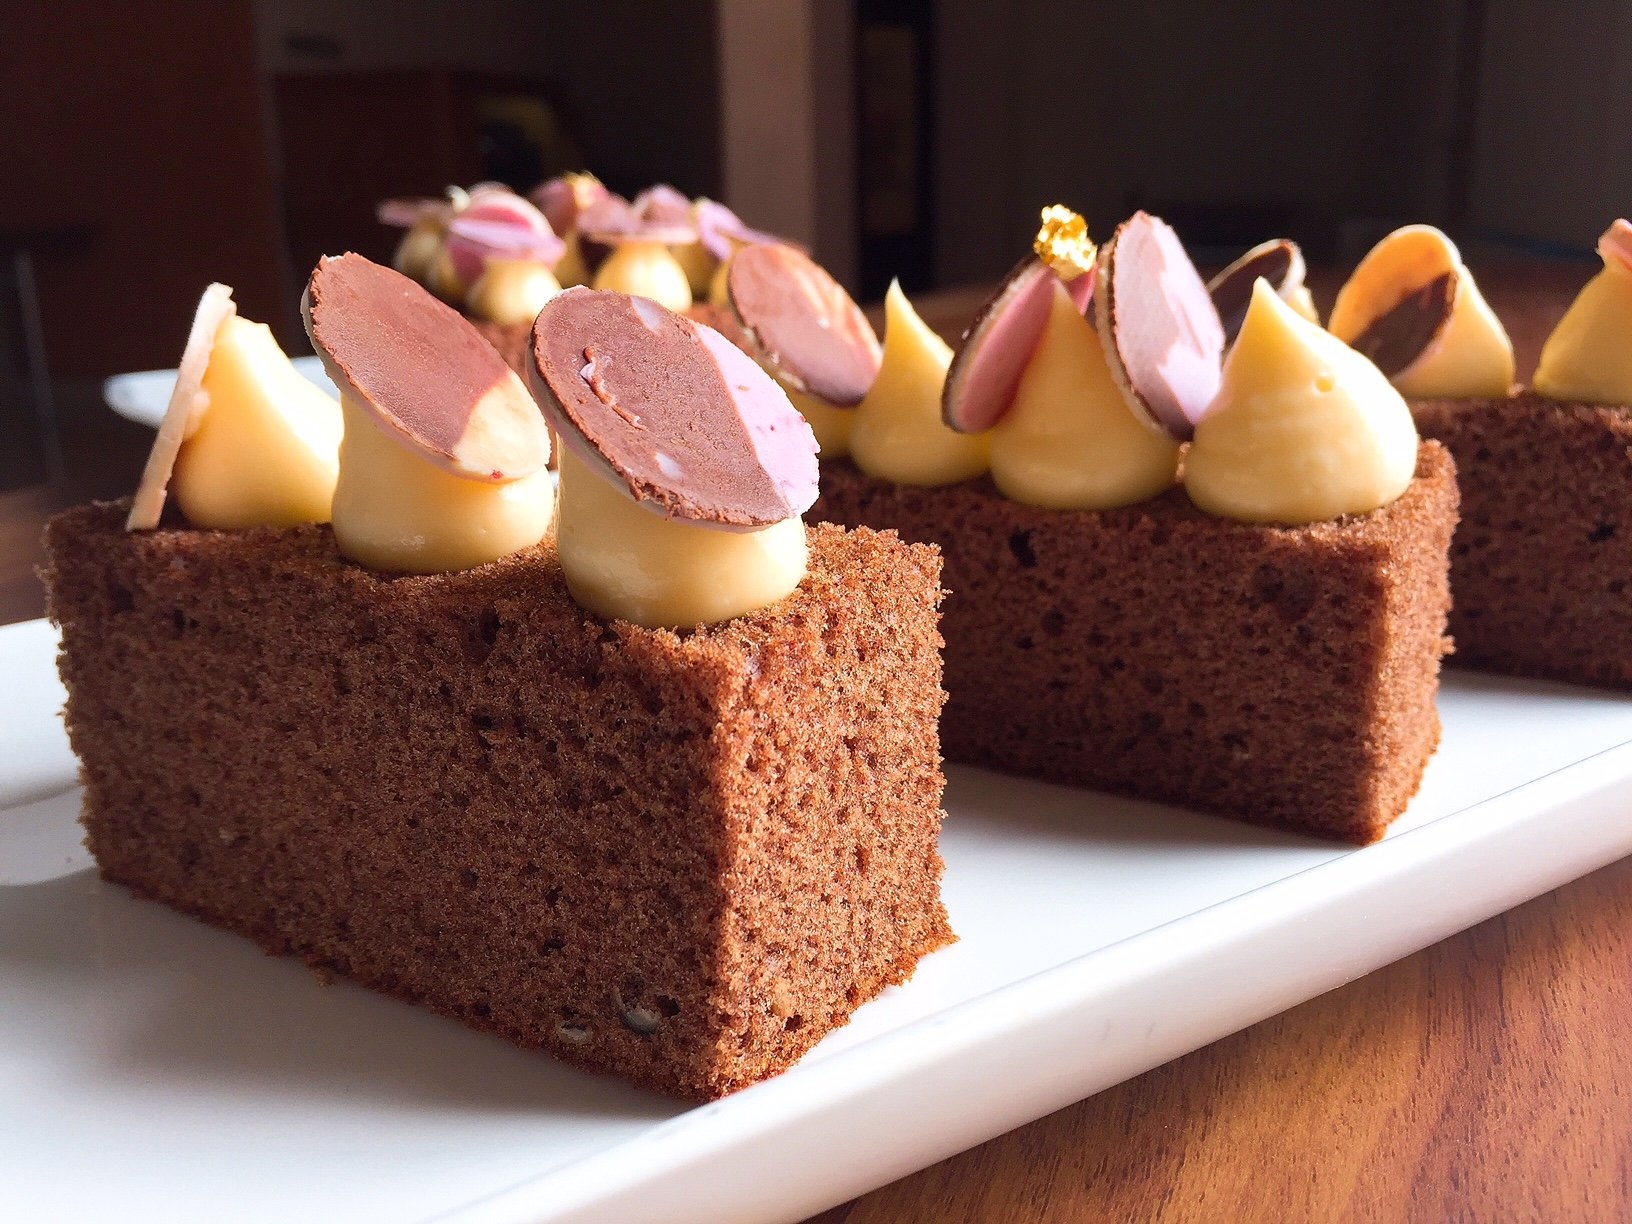 Resep Bolu Cheese Cake Jepang: Kue Bolu Coklat Panggang Cream Cheese (Krim Keju